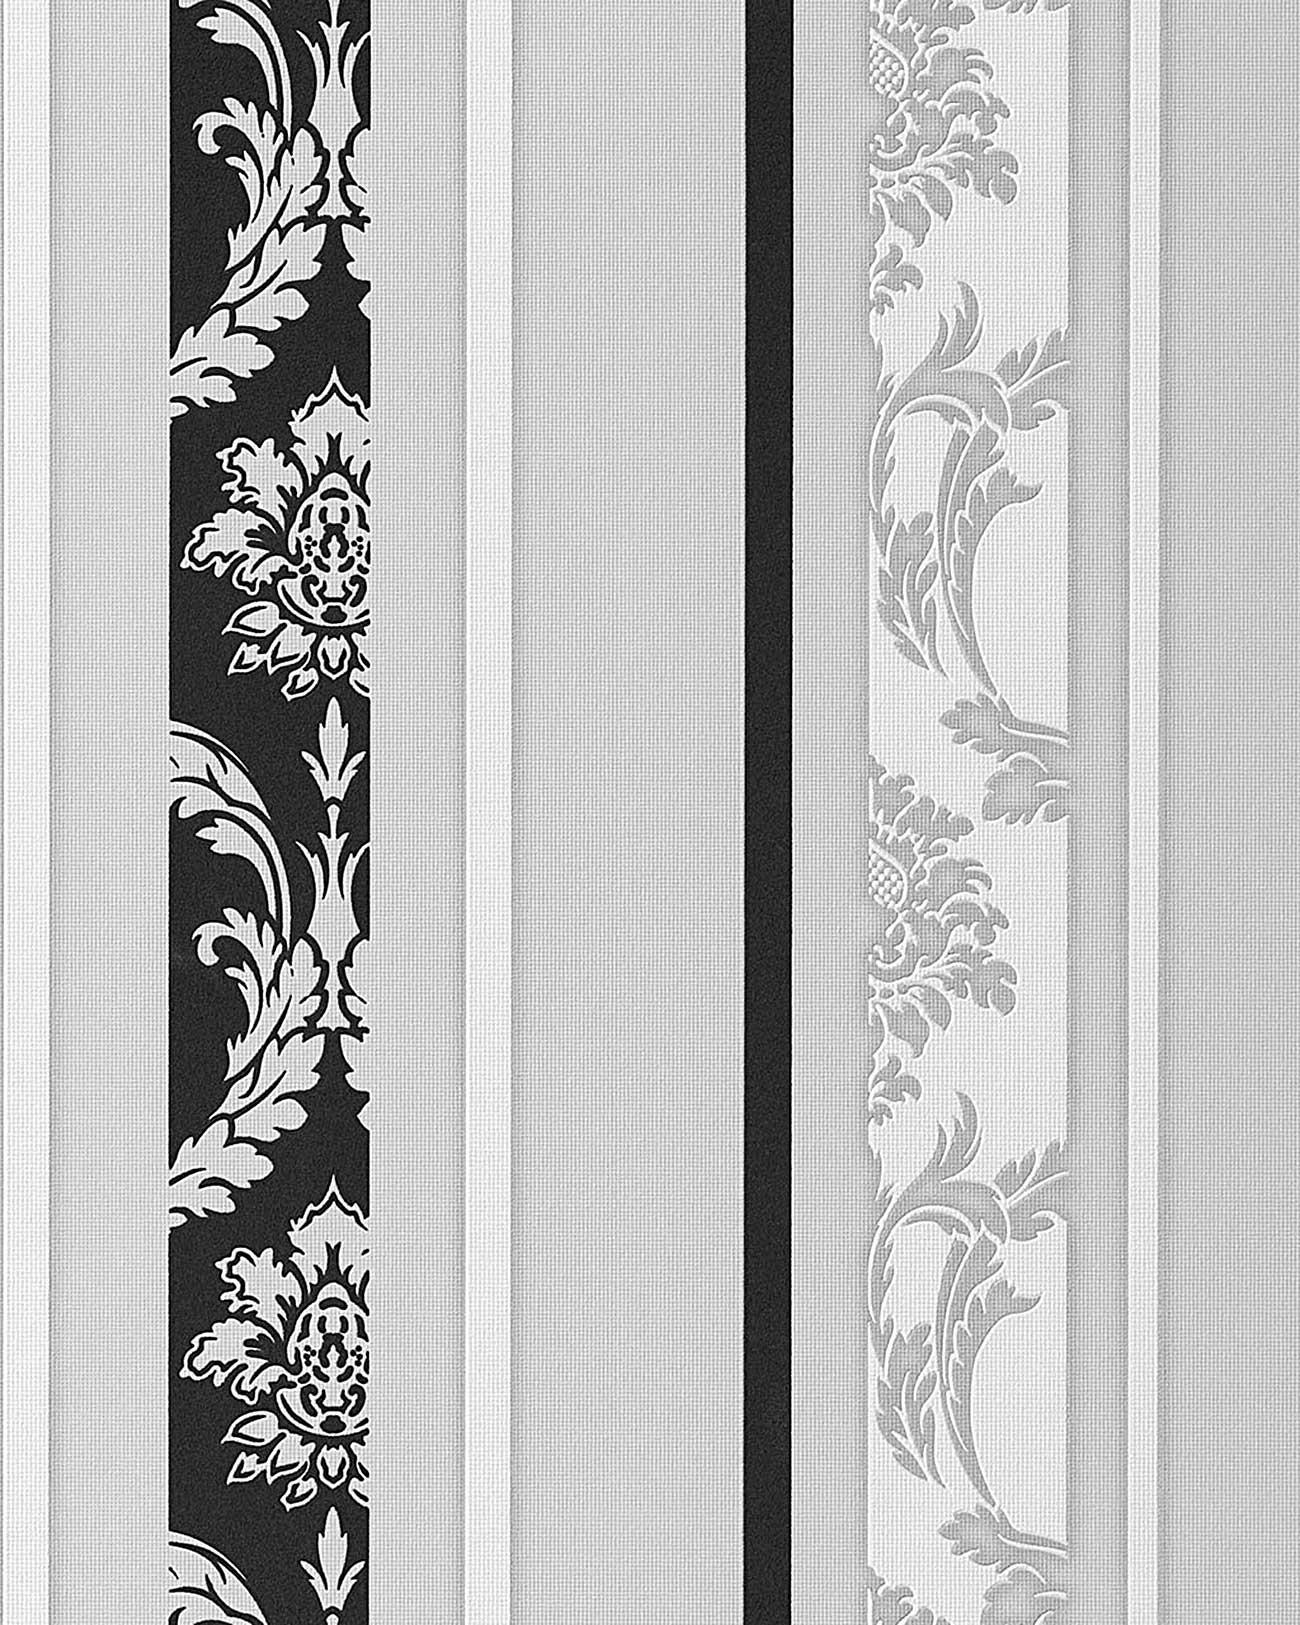 Carta da parati a righe stile damasco edem 053 20 barocco for Carta da parati stile industriale